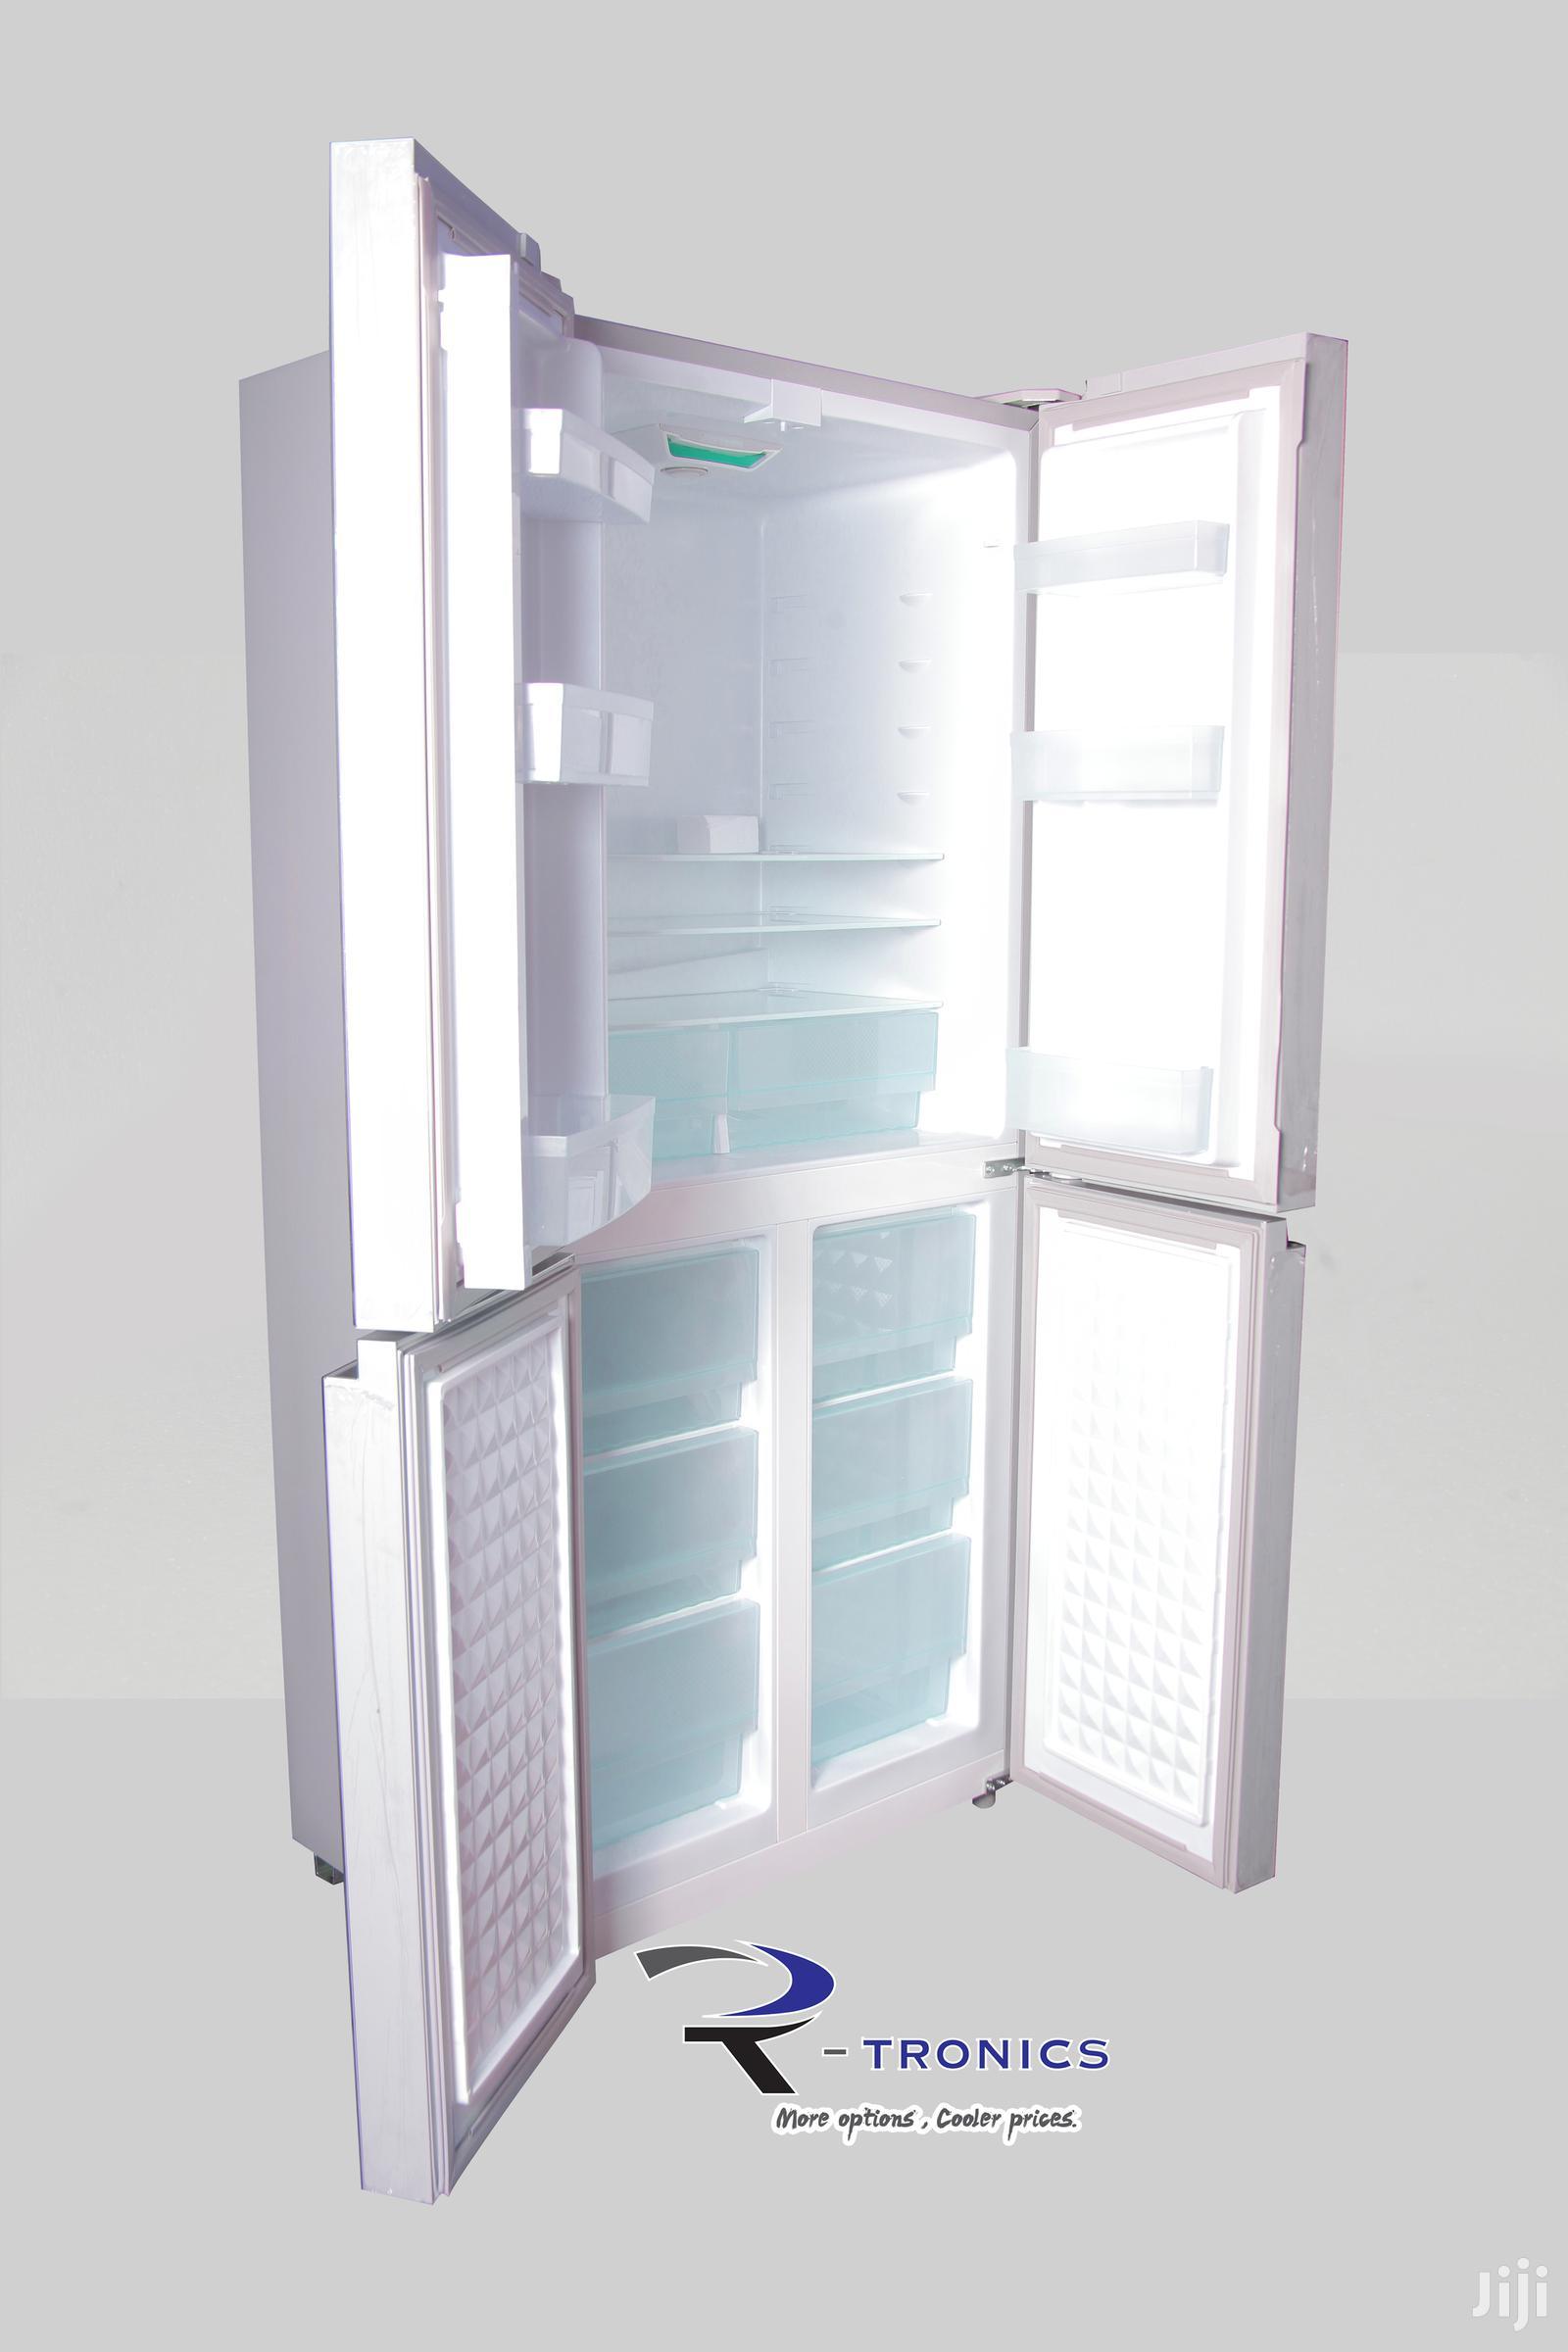 Delta Side By Side 4 Doors 406L Refrigerator – Black | Kitchen Appliances for sale in Kinondoni, Dar es Salaam, Tanzania